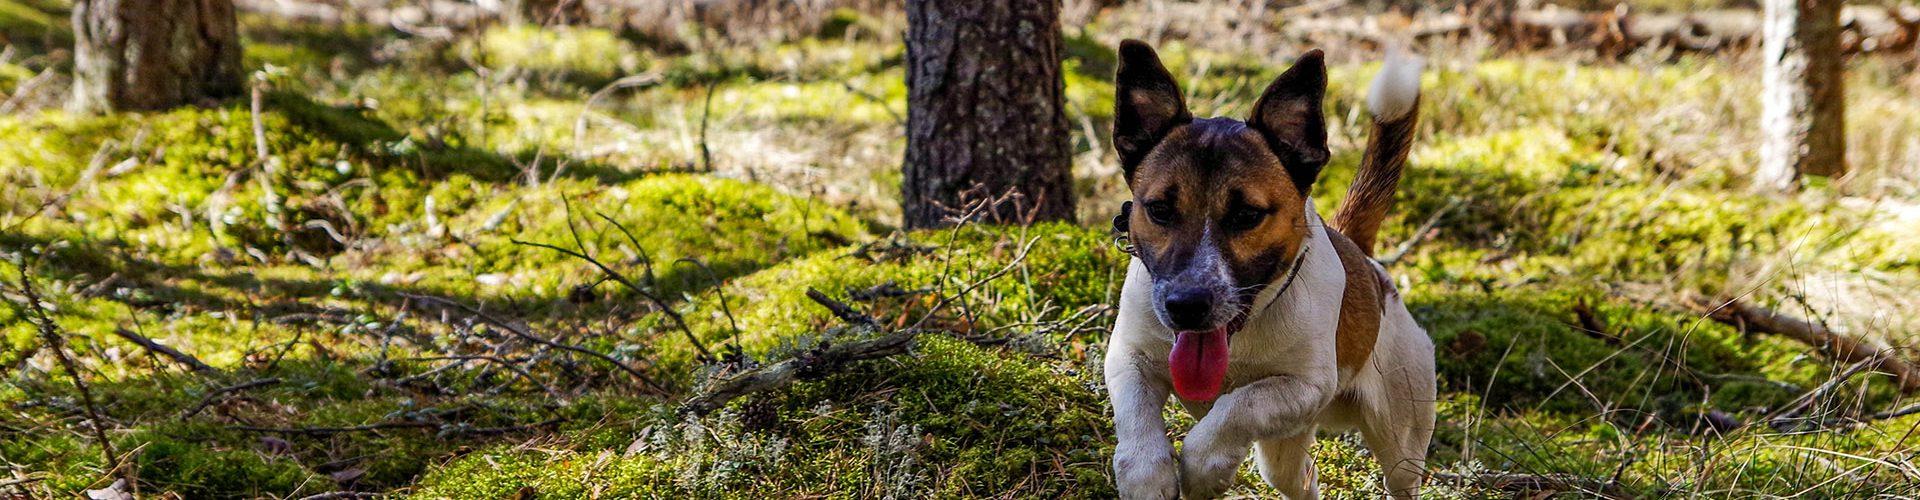 Trimtechnieken-hond-img-1